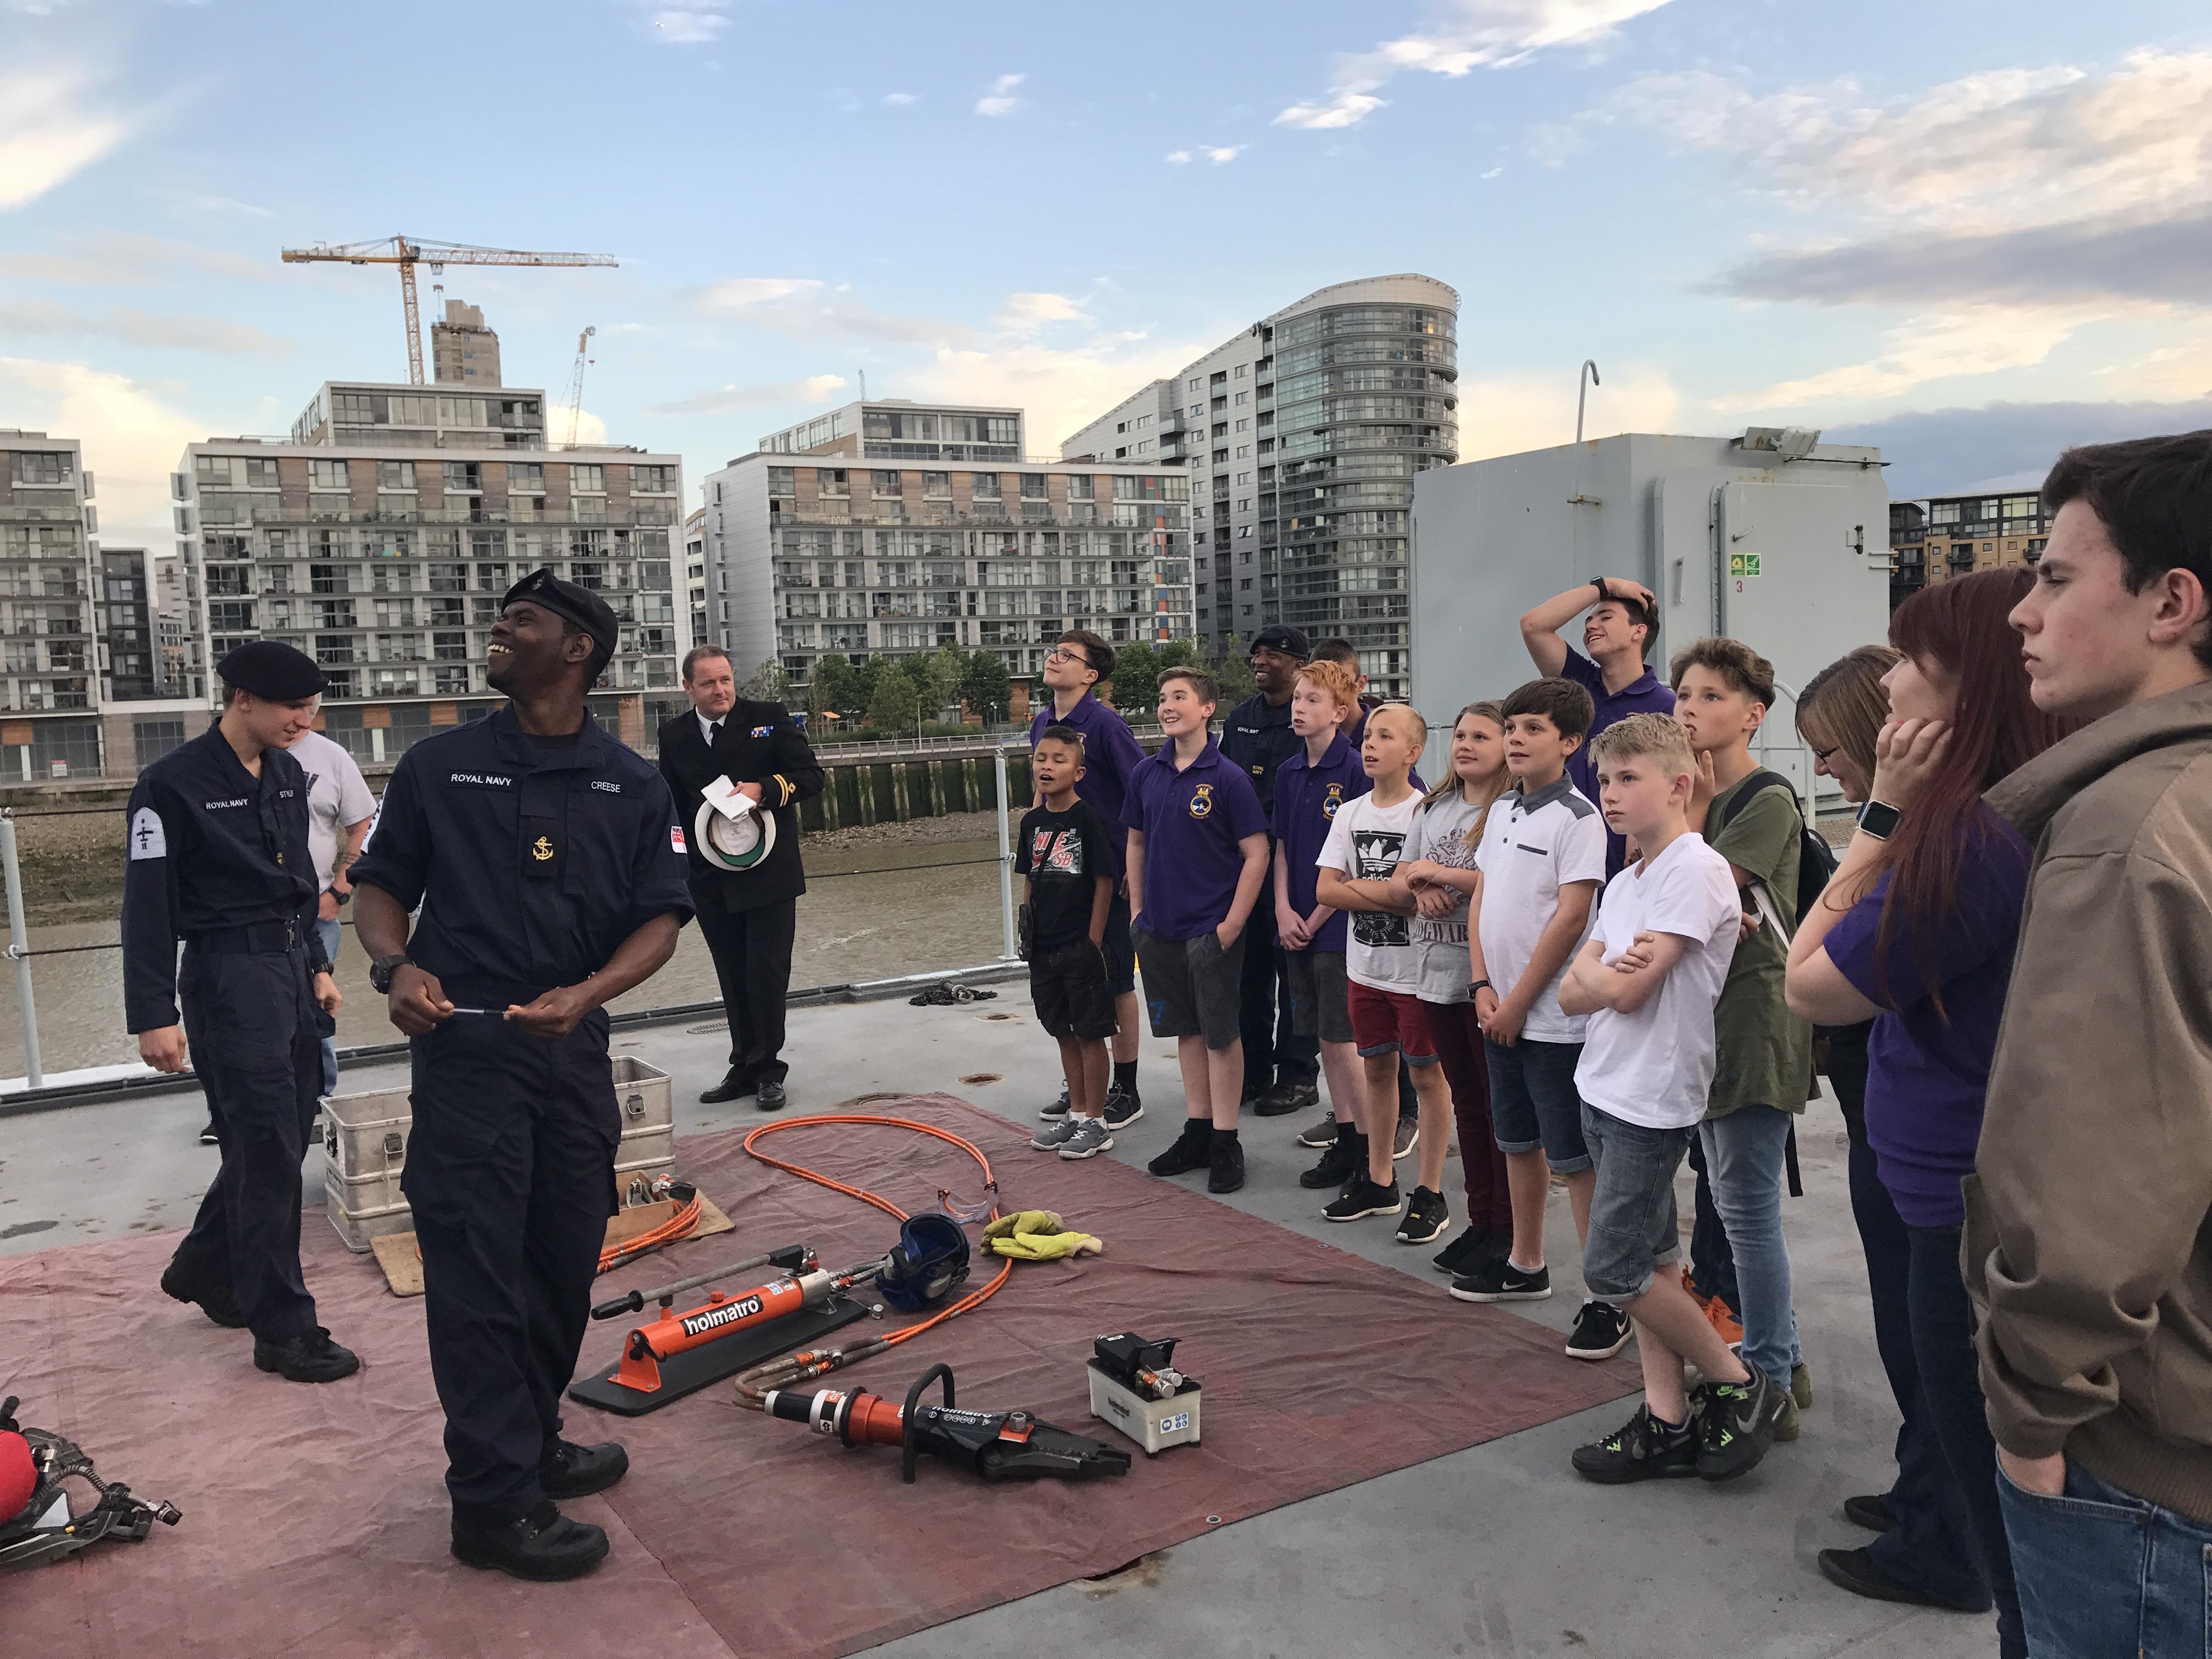 Sea Cadets visit RFA Argus to mark Seafarers Awareness Week